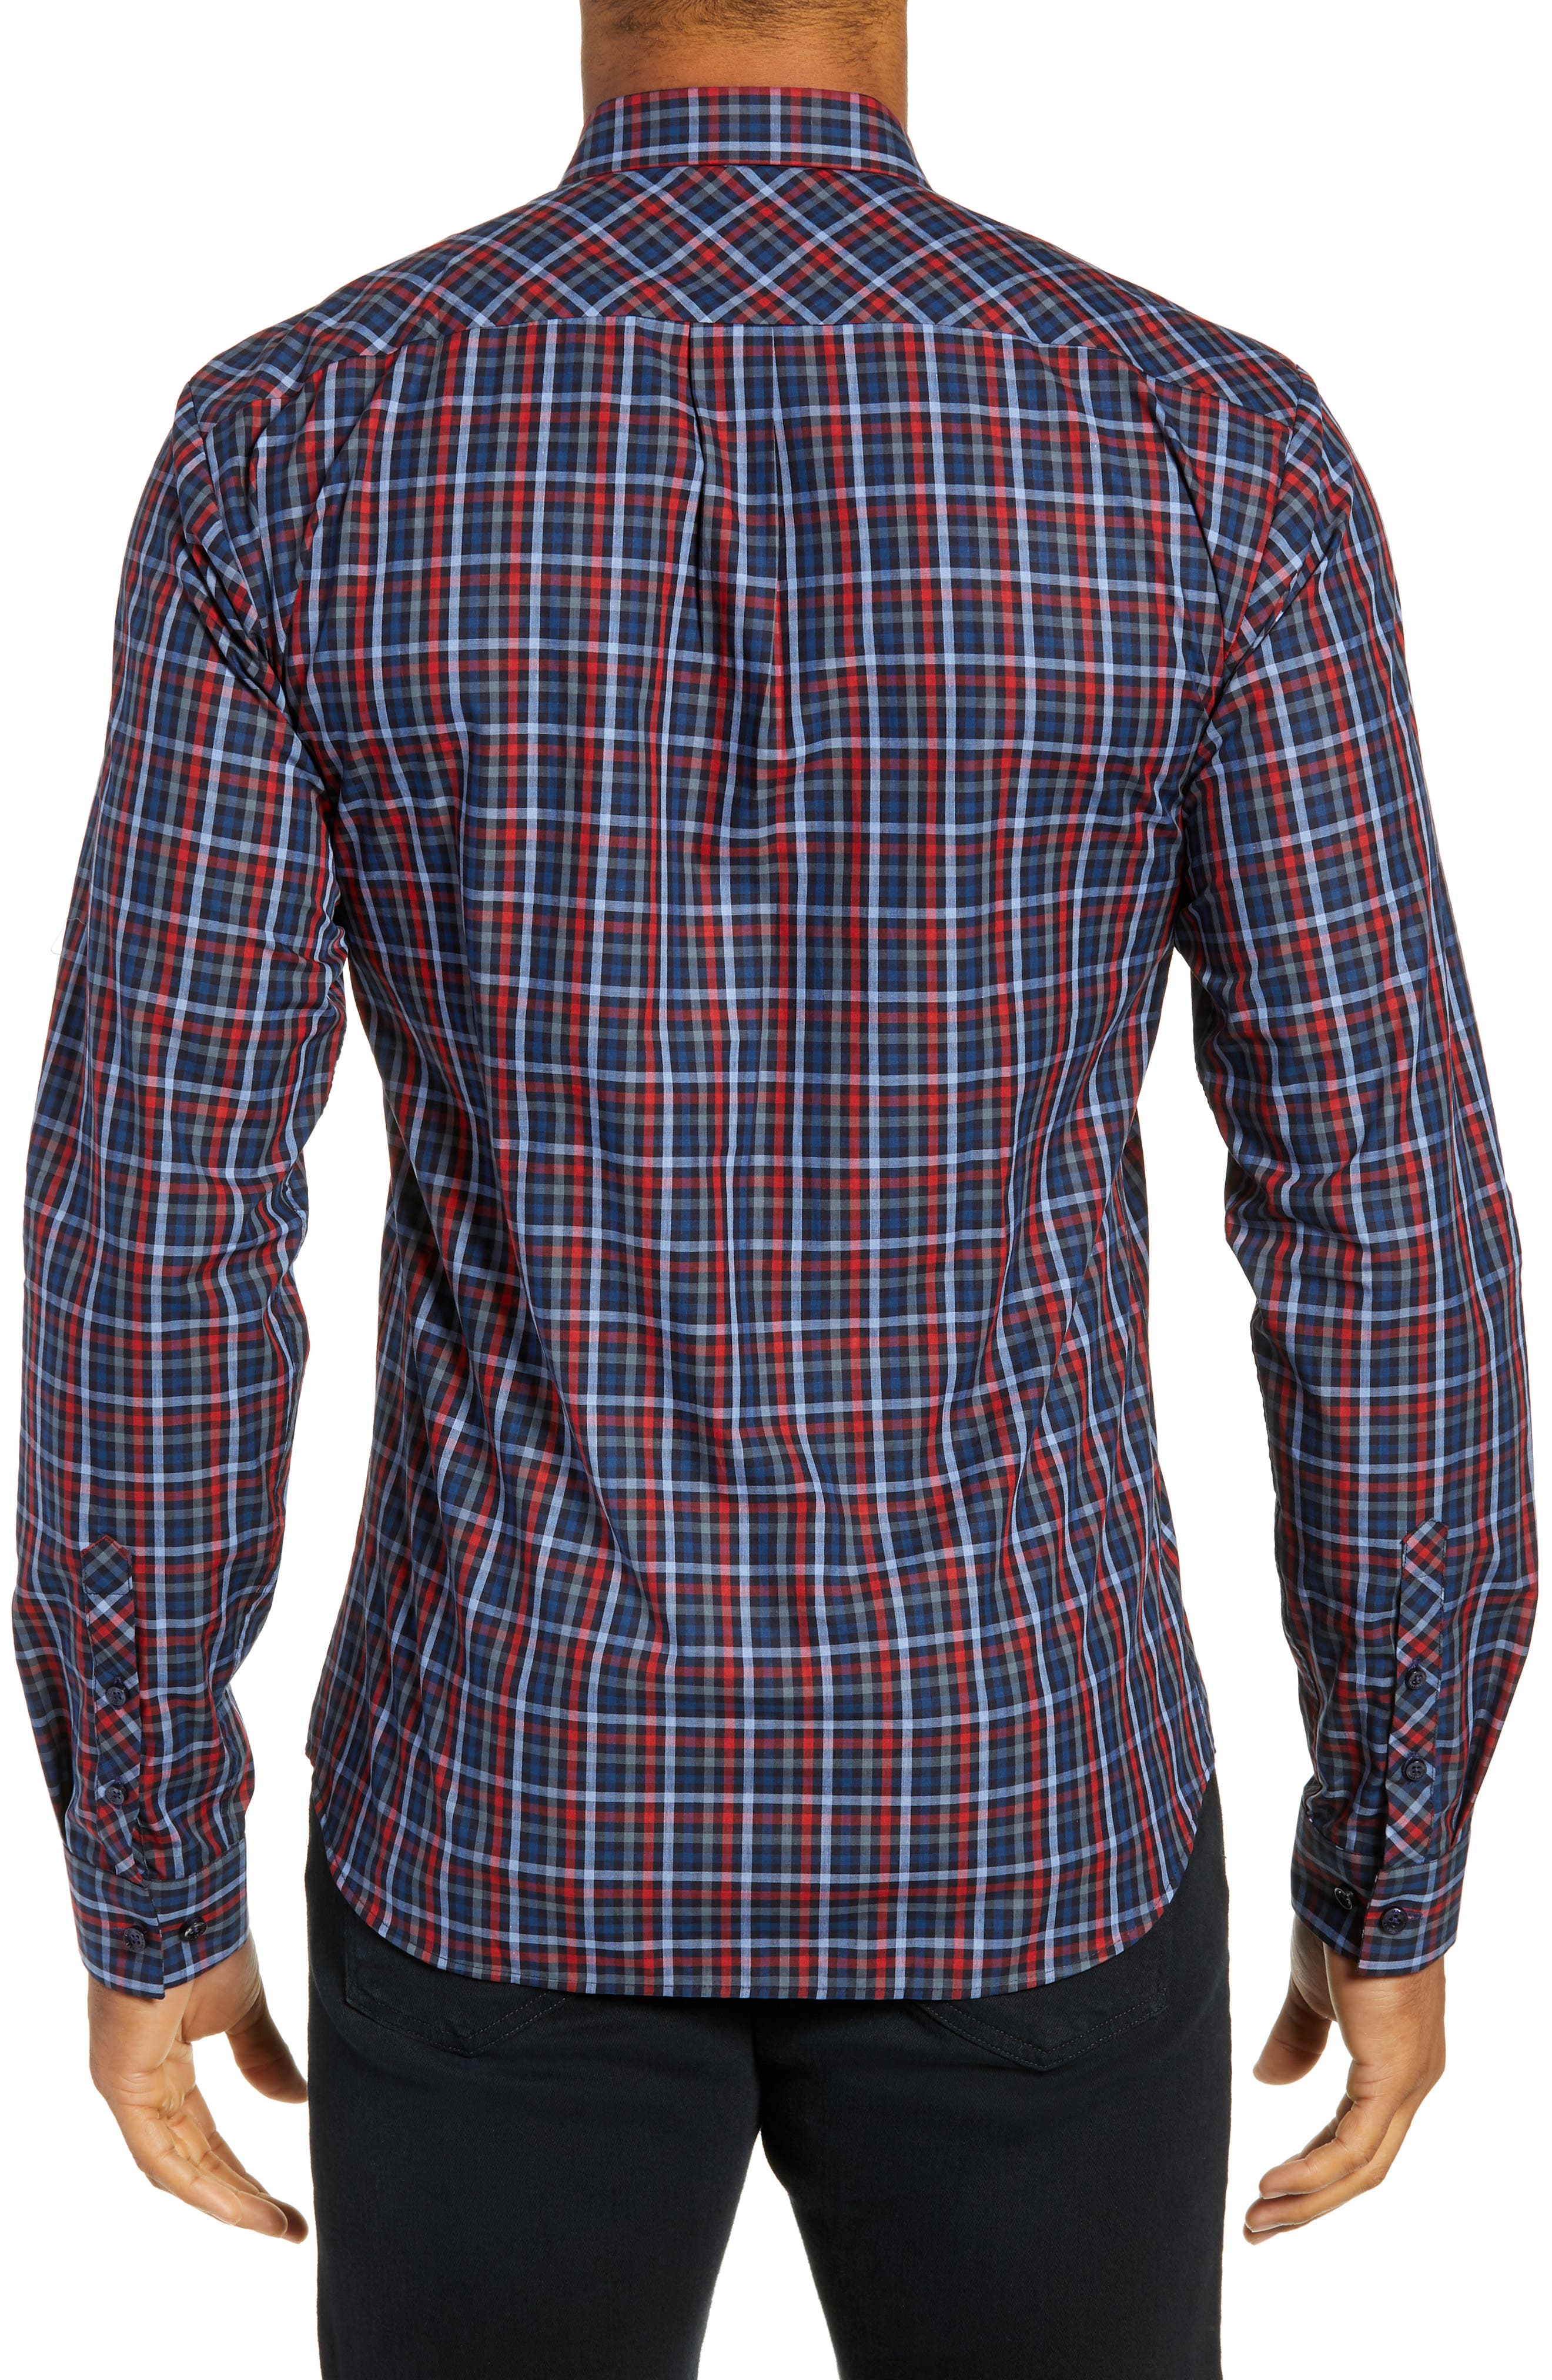 Trim Fit Sport Shirt,                             Alternate thumbnail 3, color,                             RED - BLUE MULTI CHECK